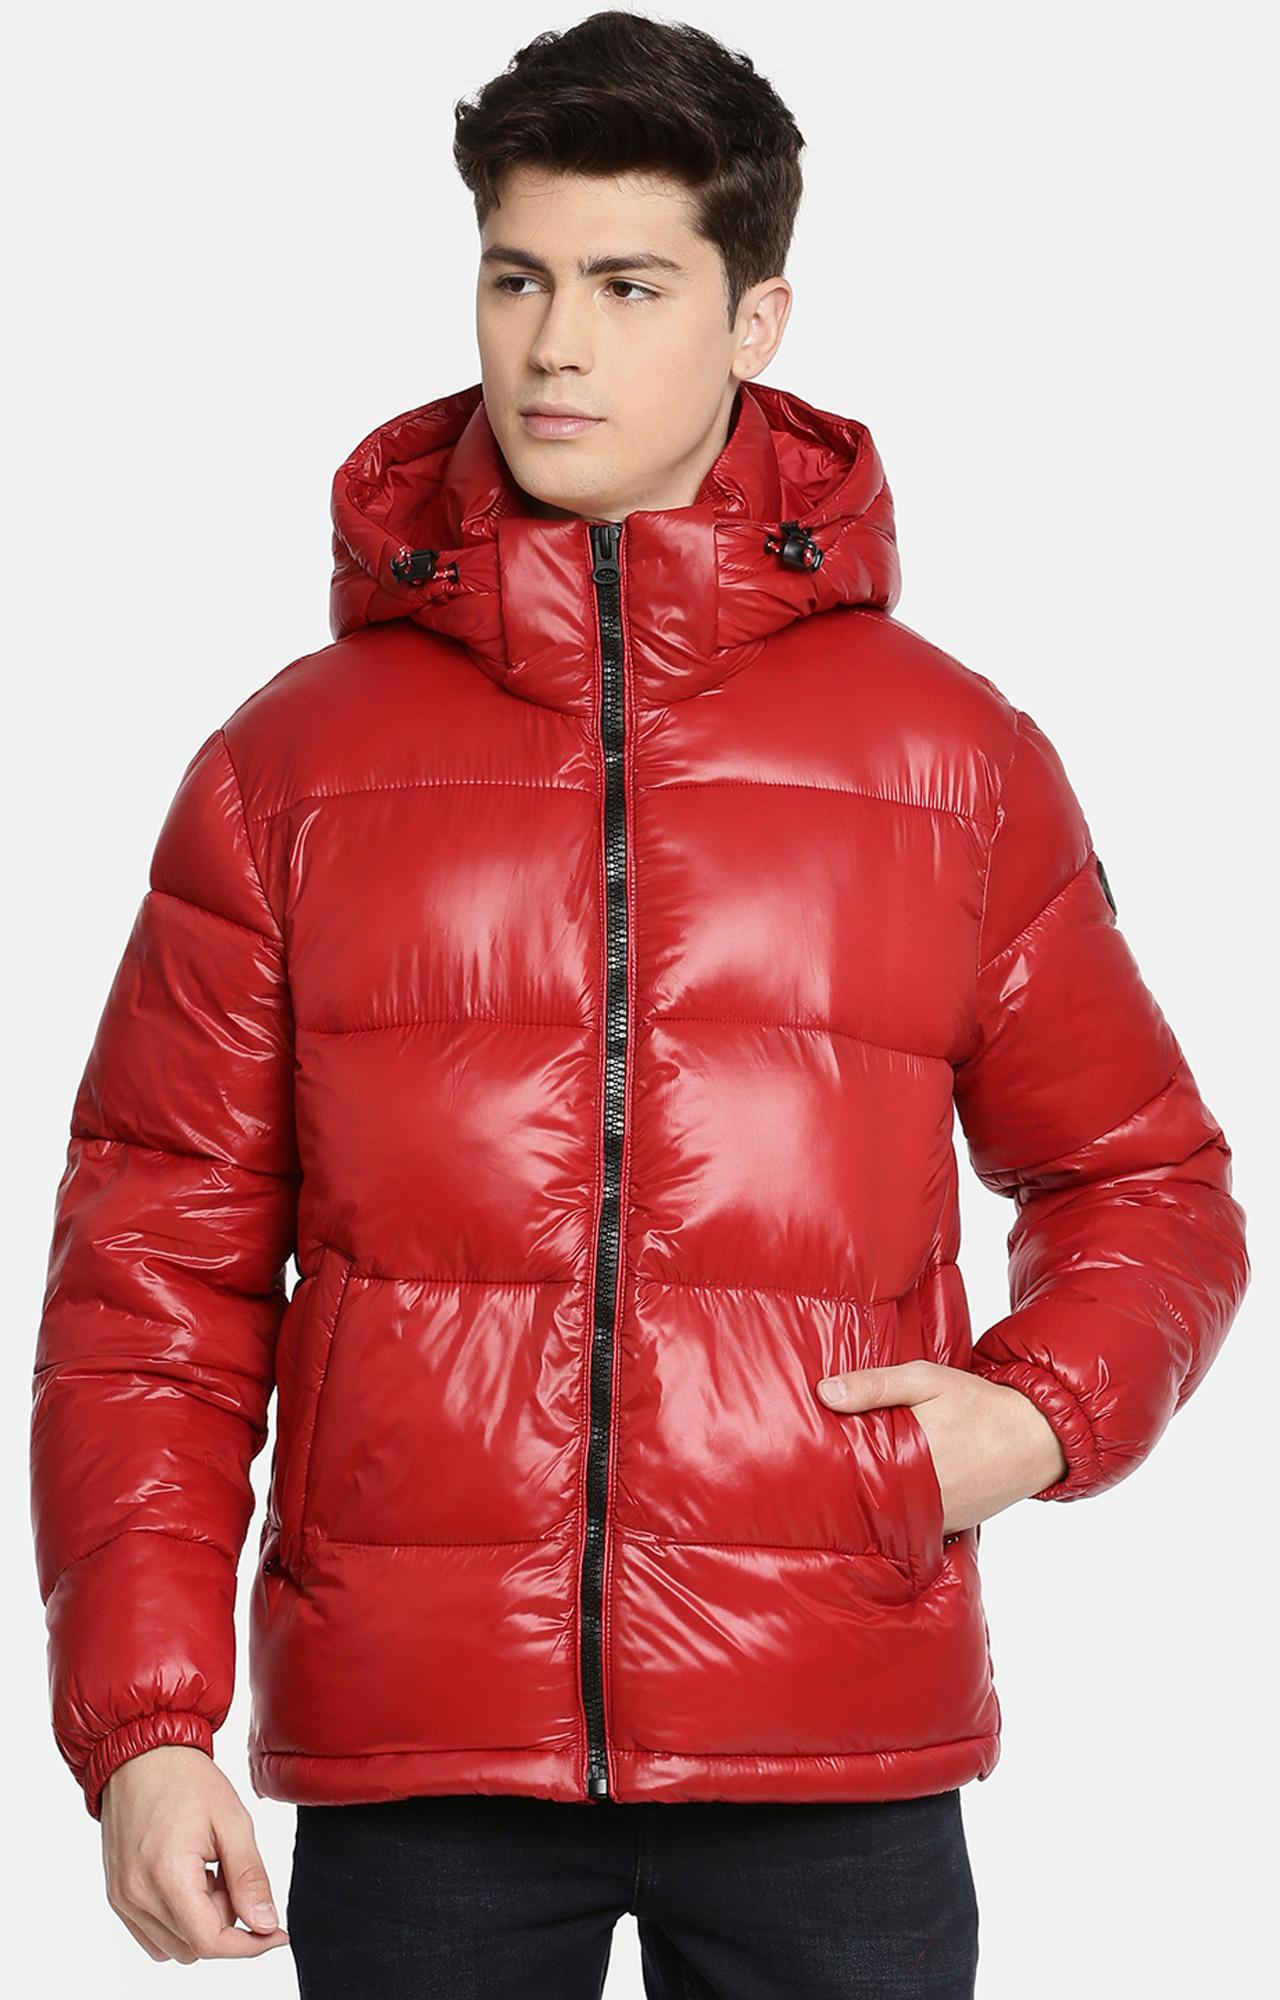 celio | Red Solid Bomber Jacket